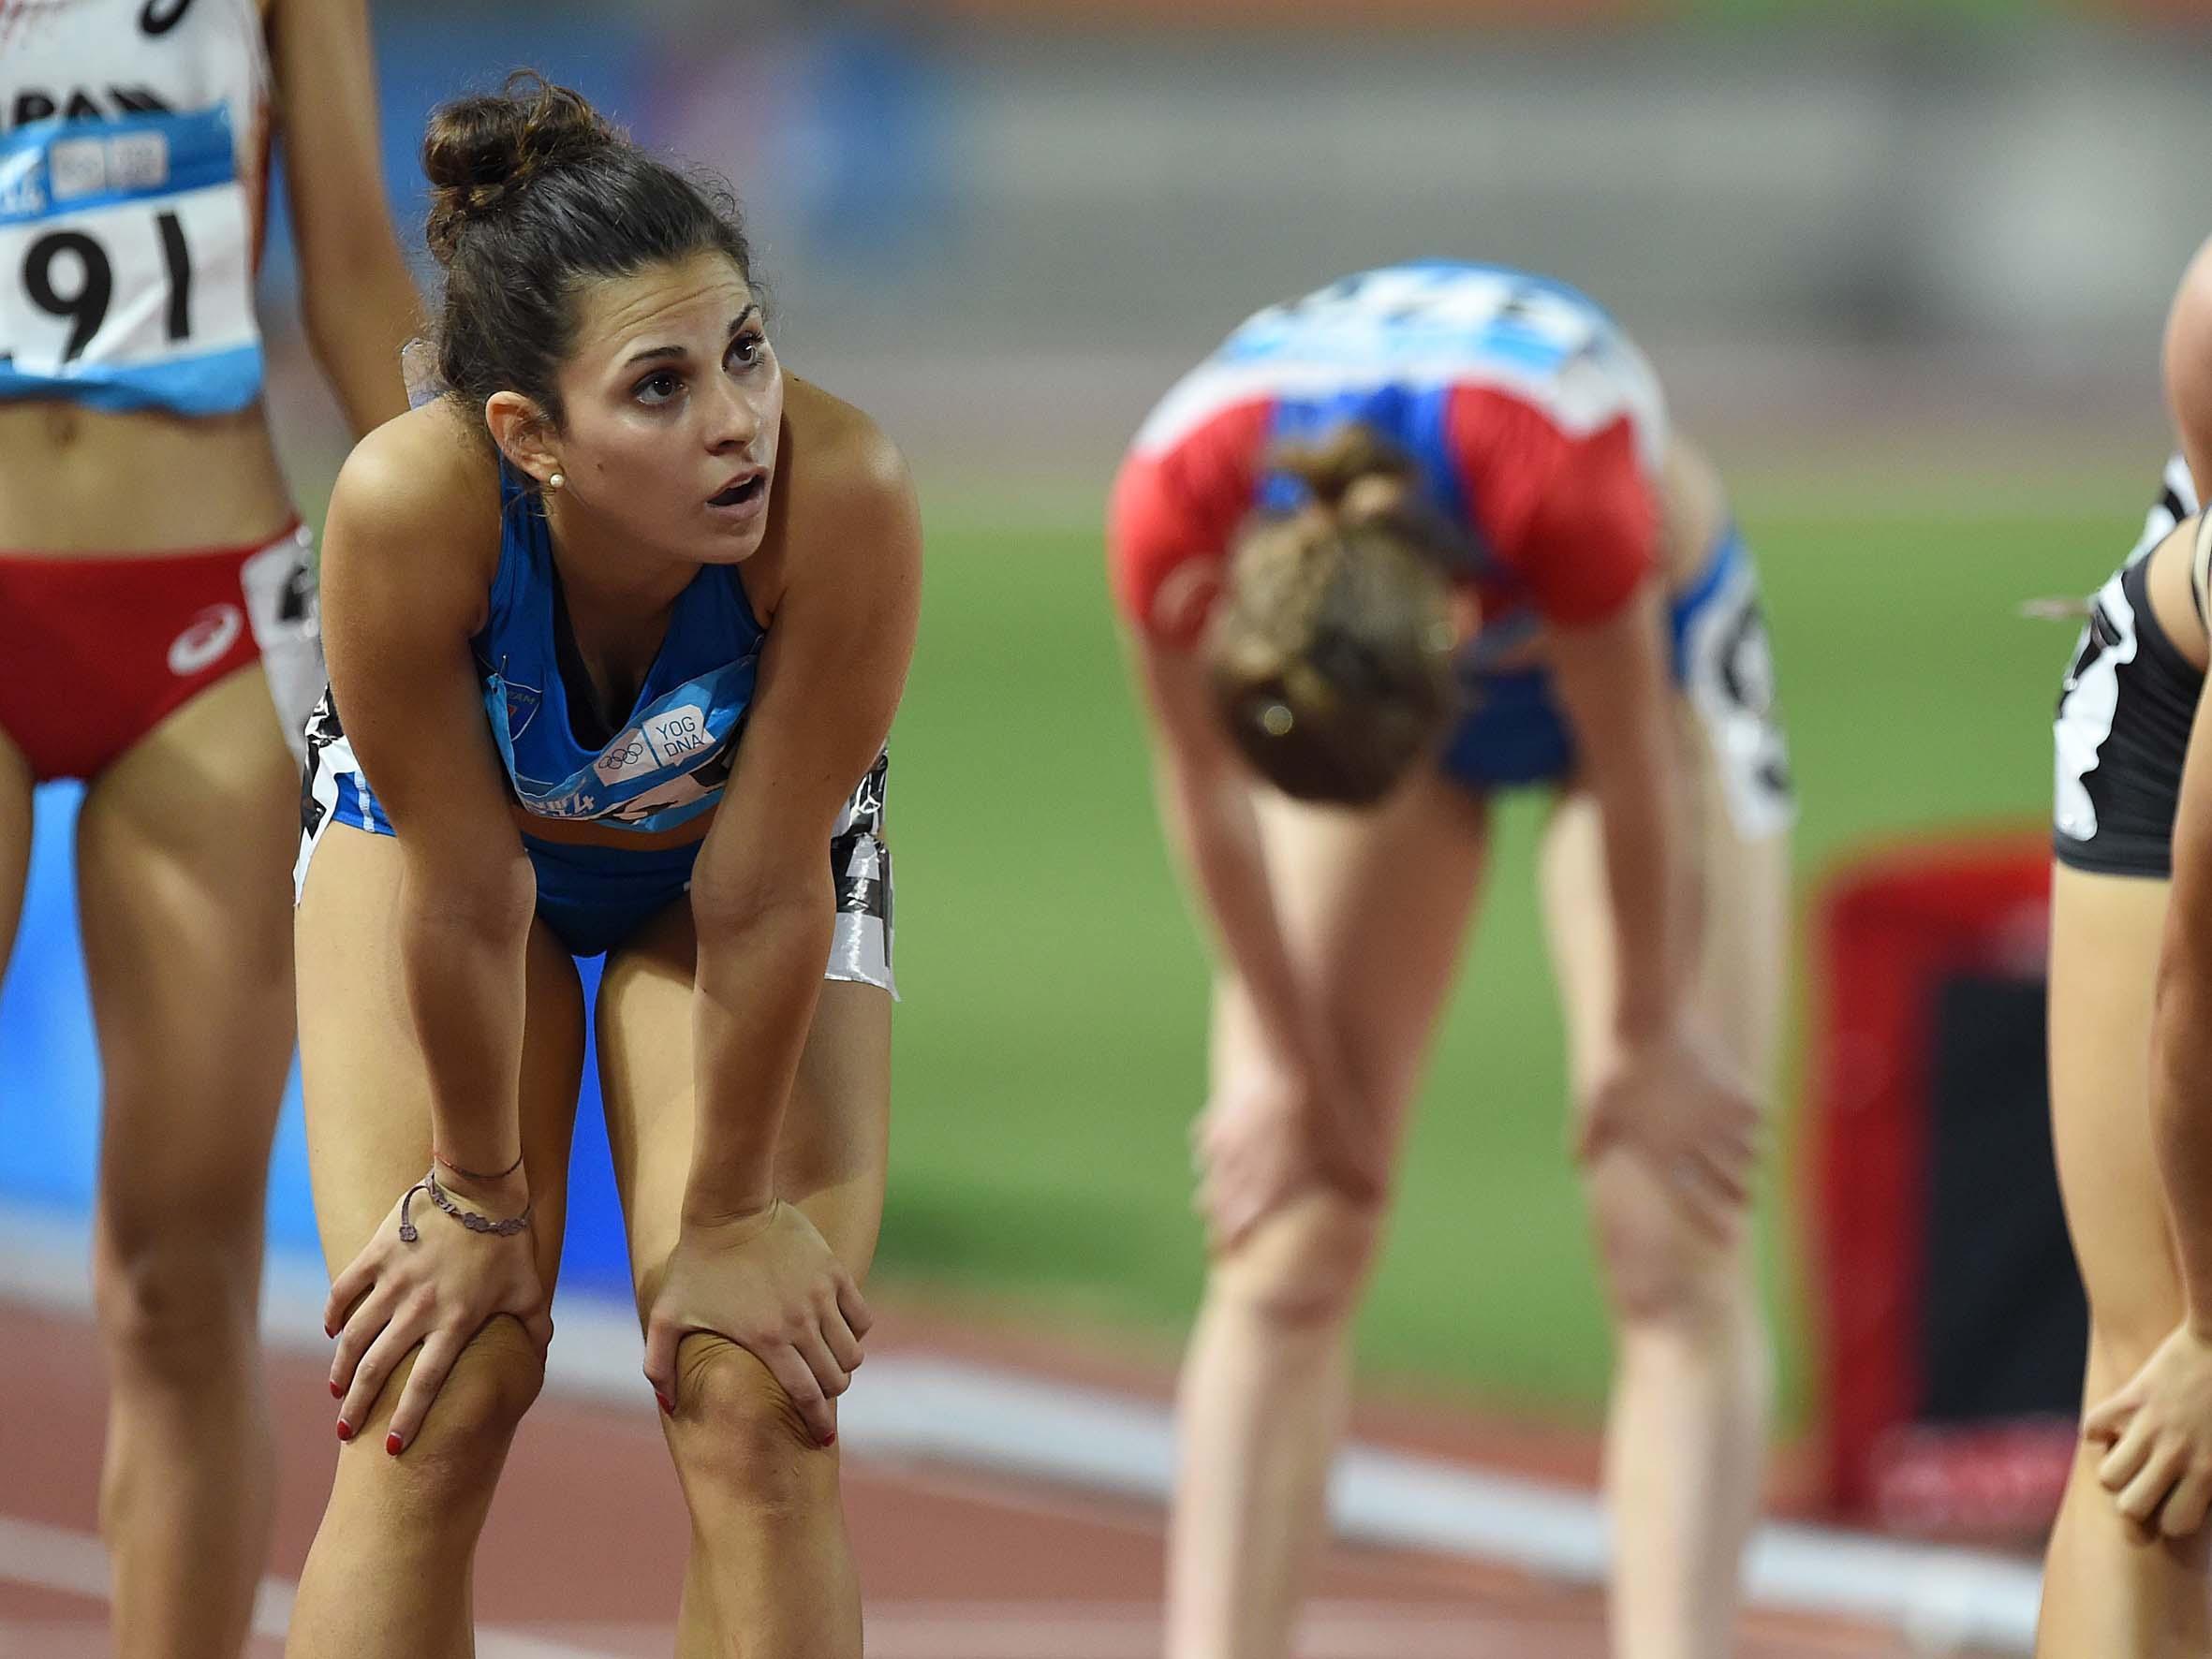 Atletica Donne 800 metri 06